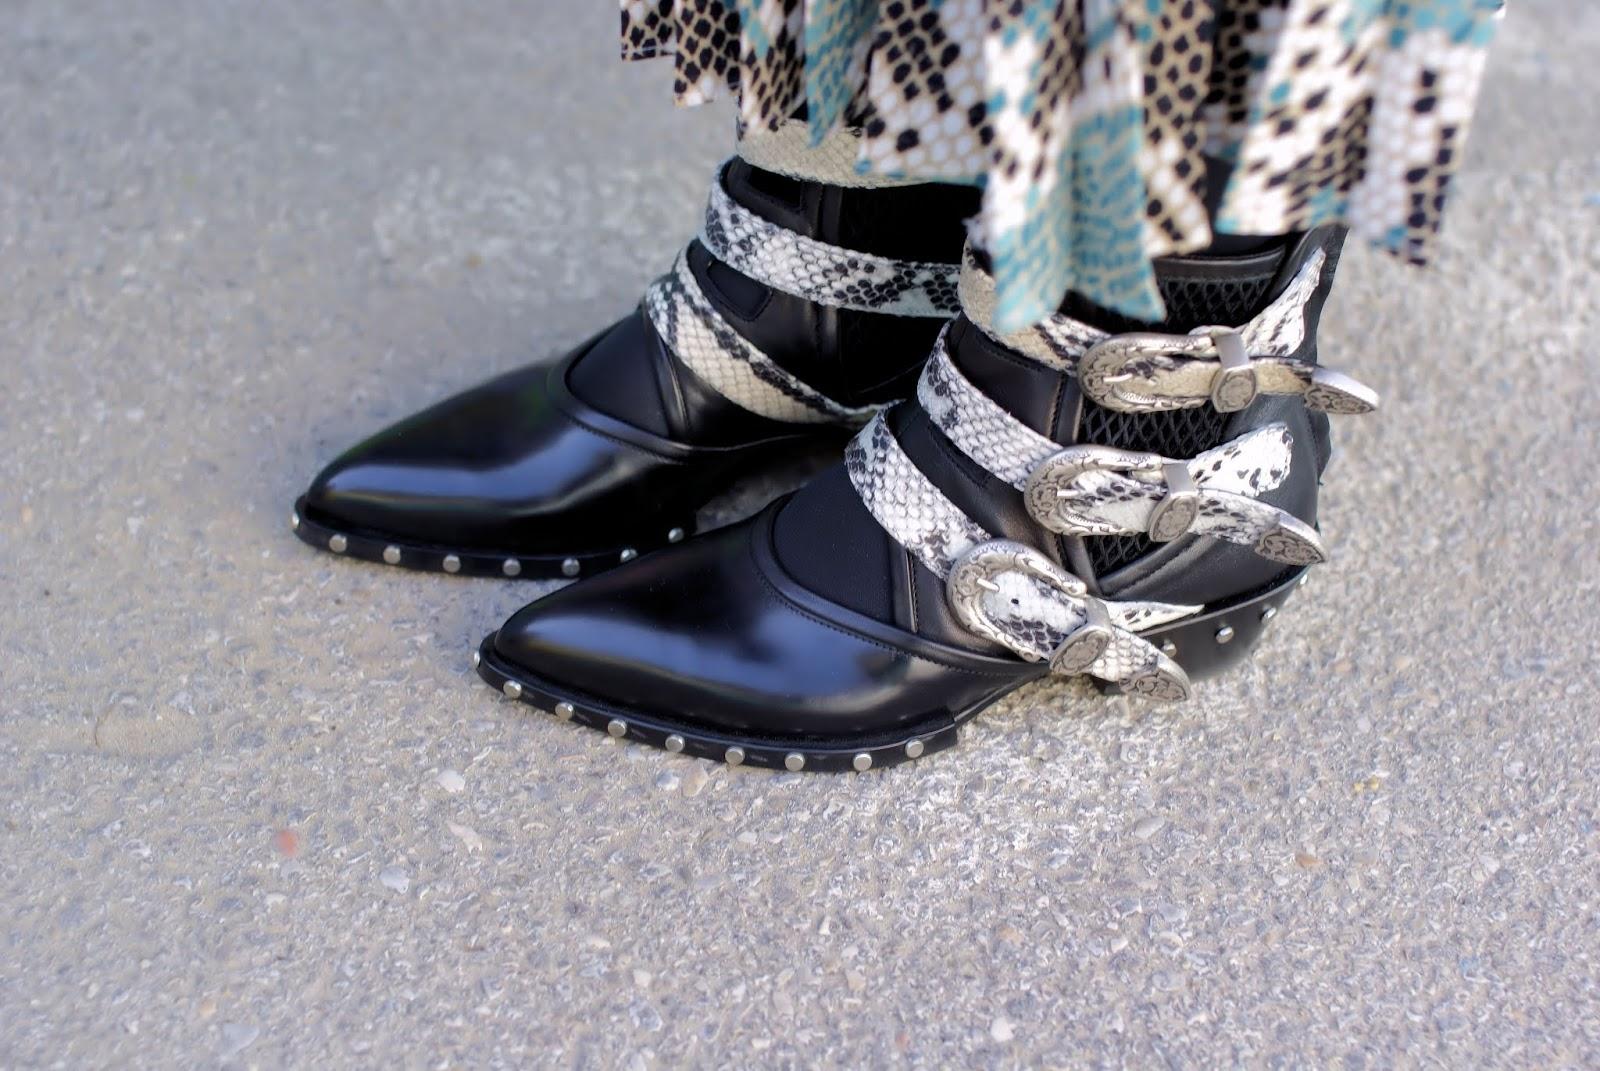 Stivaletti texani Barracuda su Fashion and Cookies fashion blog, fashion blogger style